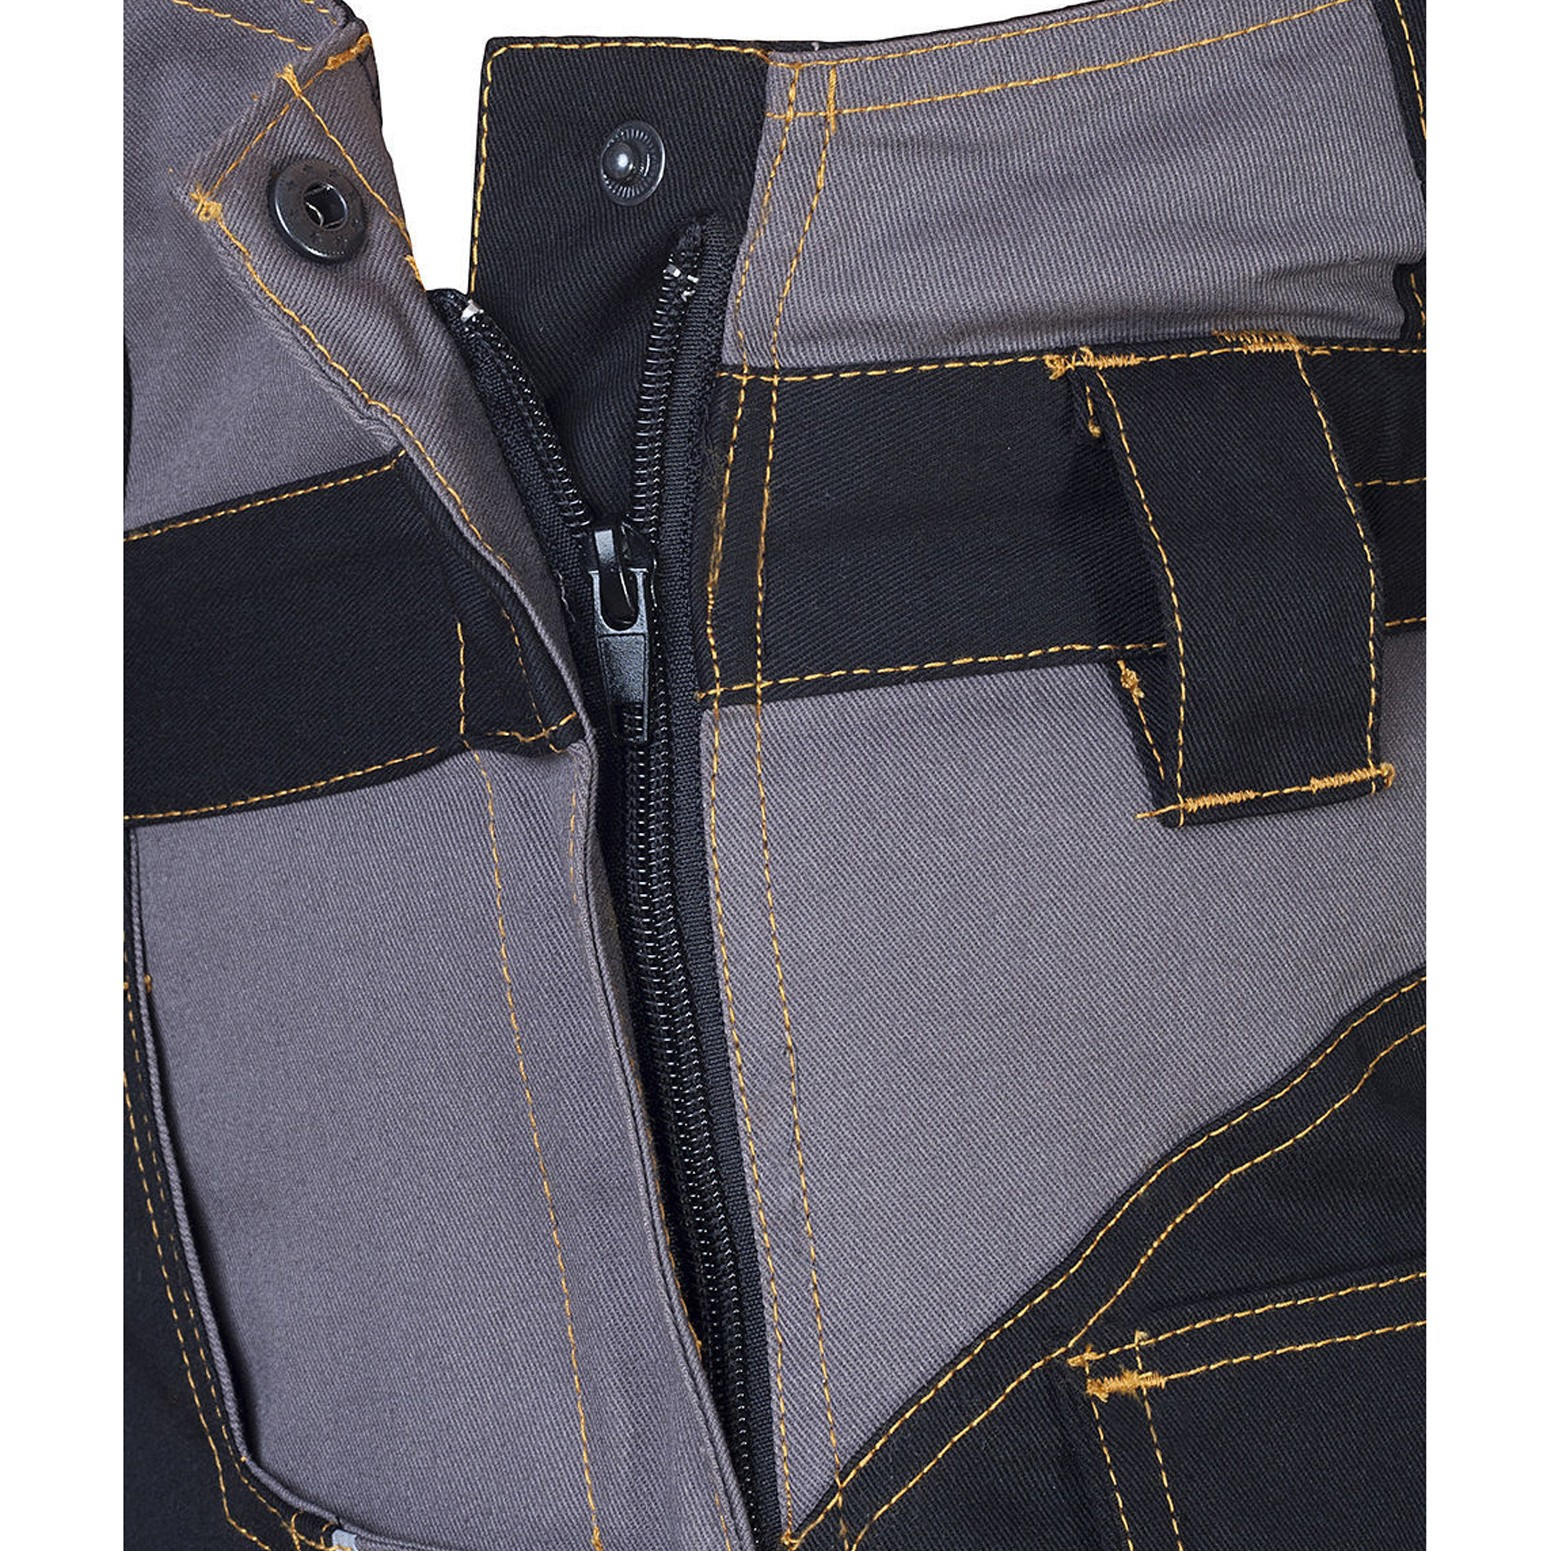 VIS-L 46, Grau Arbeitslatzhose Sicherheitshose Arbeitshose Kombihose Schwarz Ardo